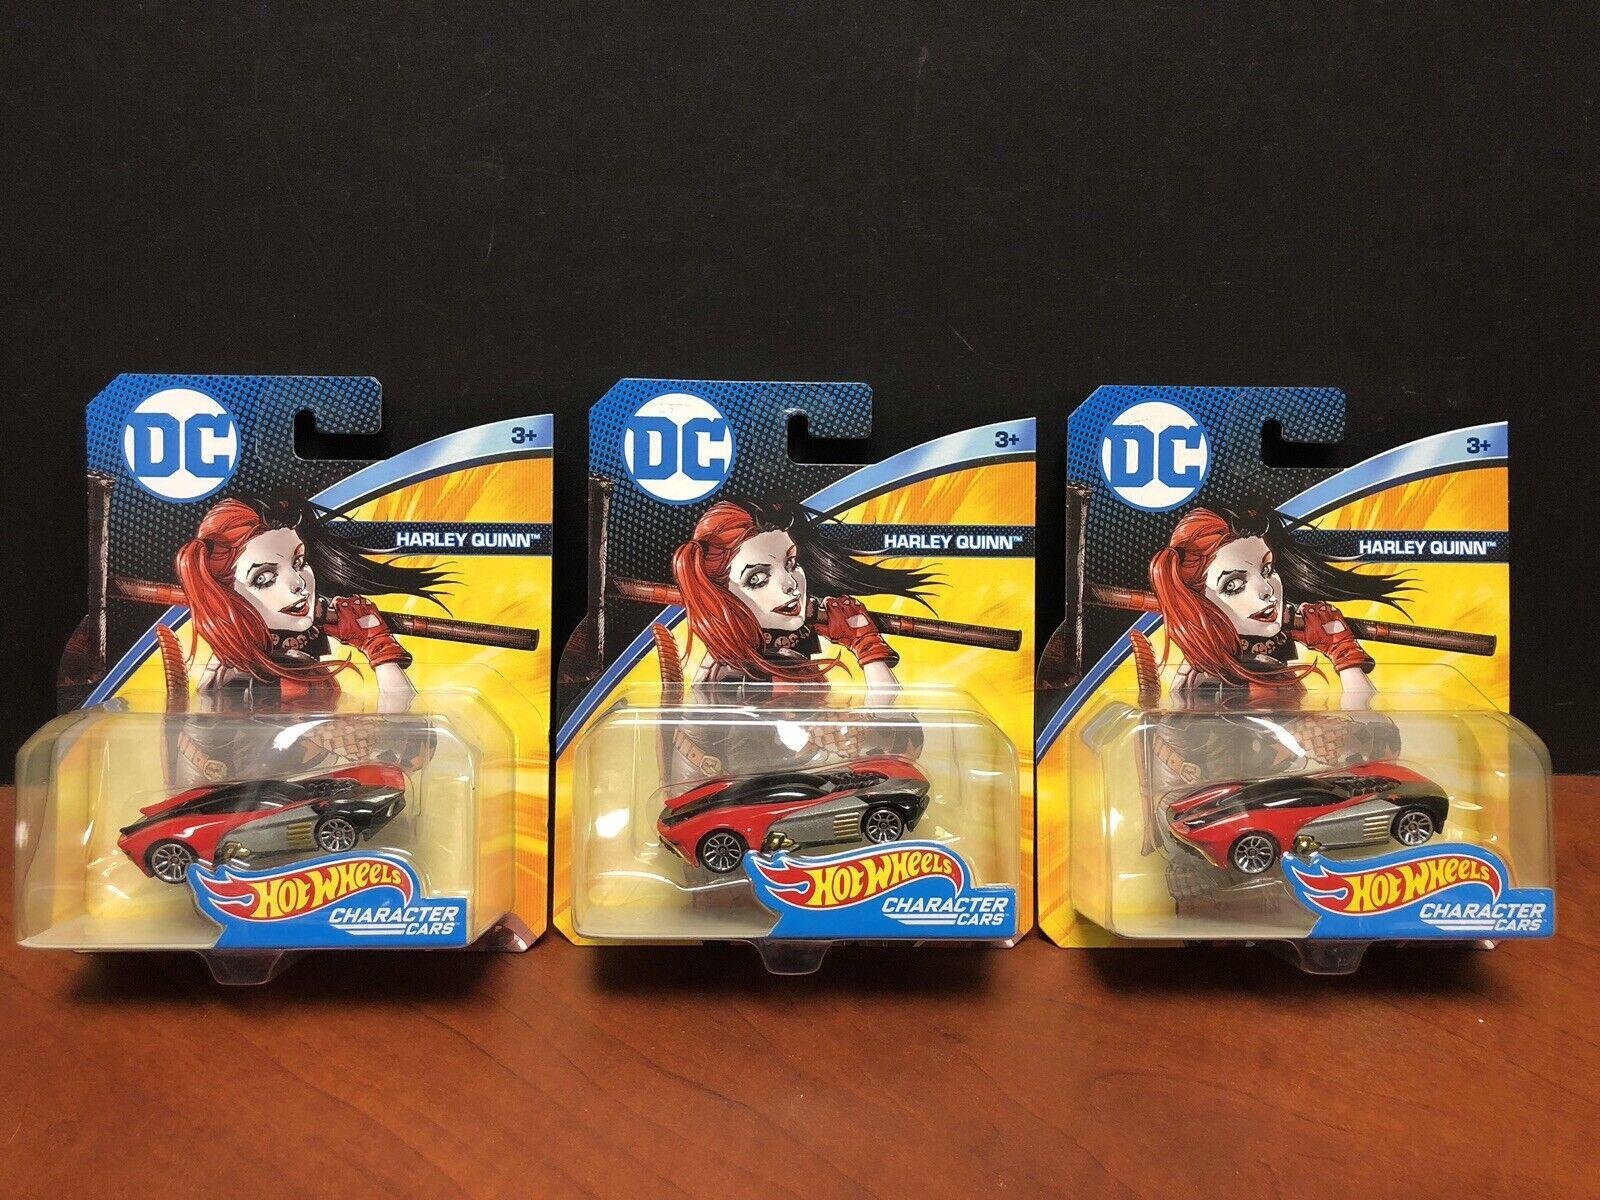 Hot Wtalons  DC Character voitures Harley Quinn Lot Of 3 EM2534  magasin de gros